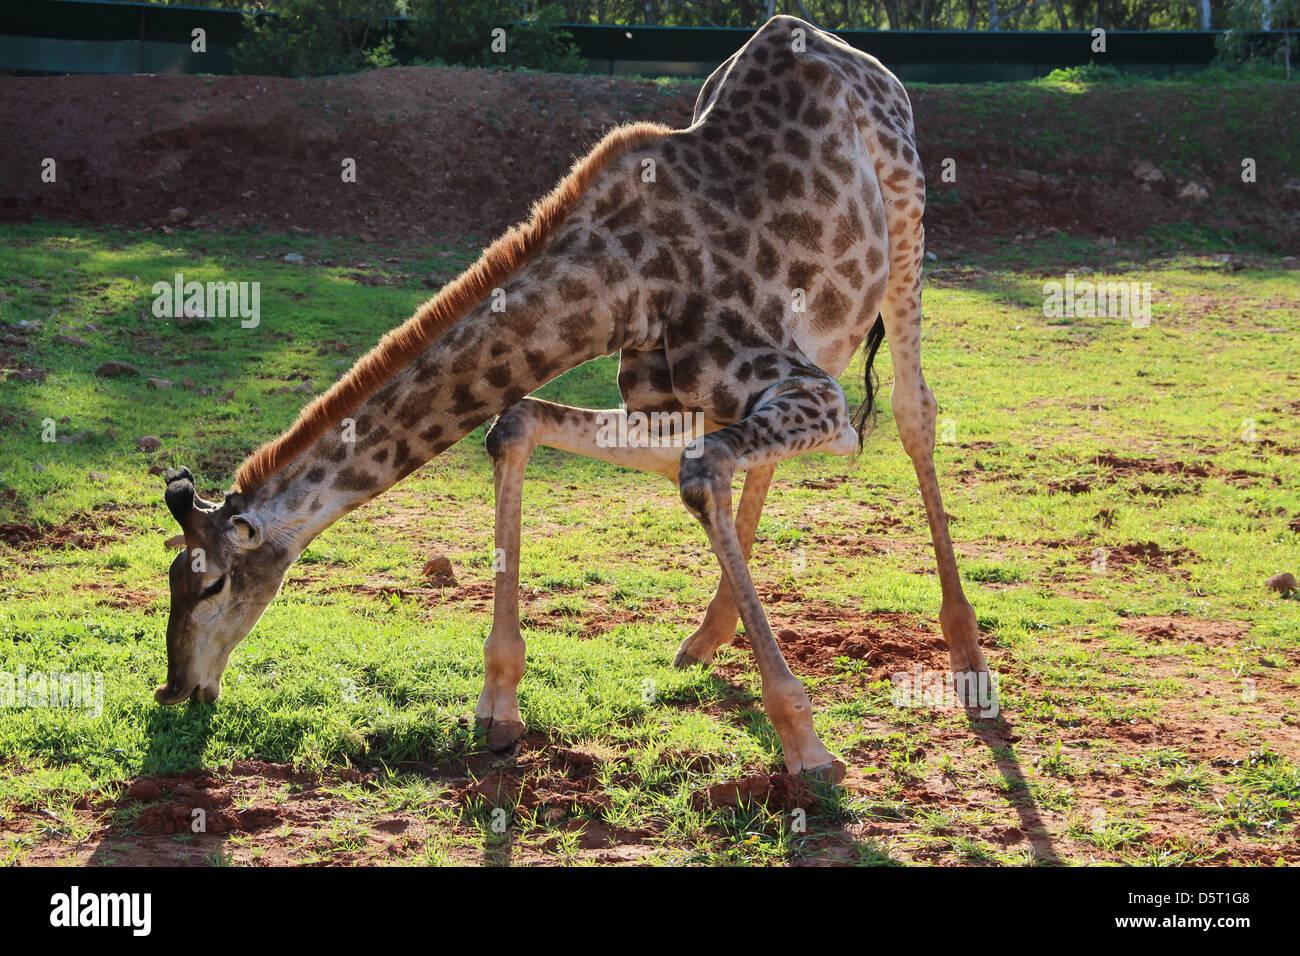 Giraffe squatting Stock Photo